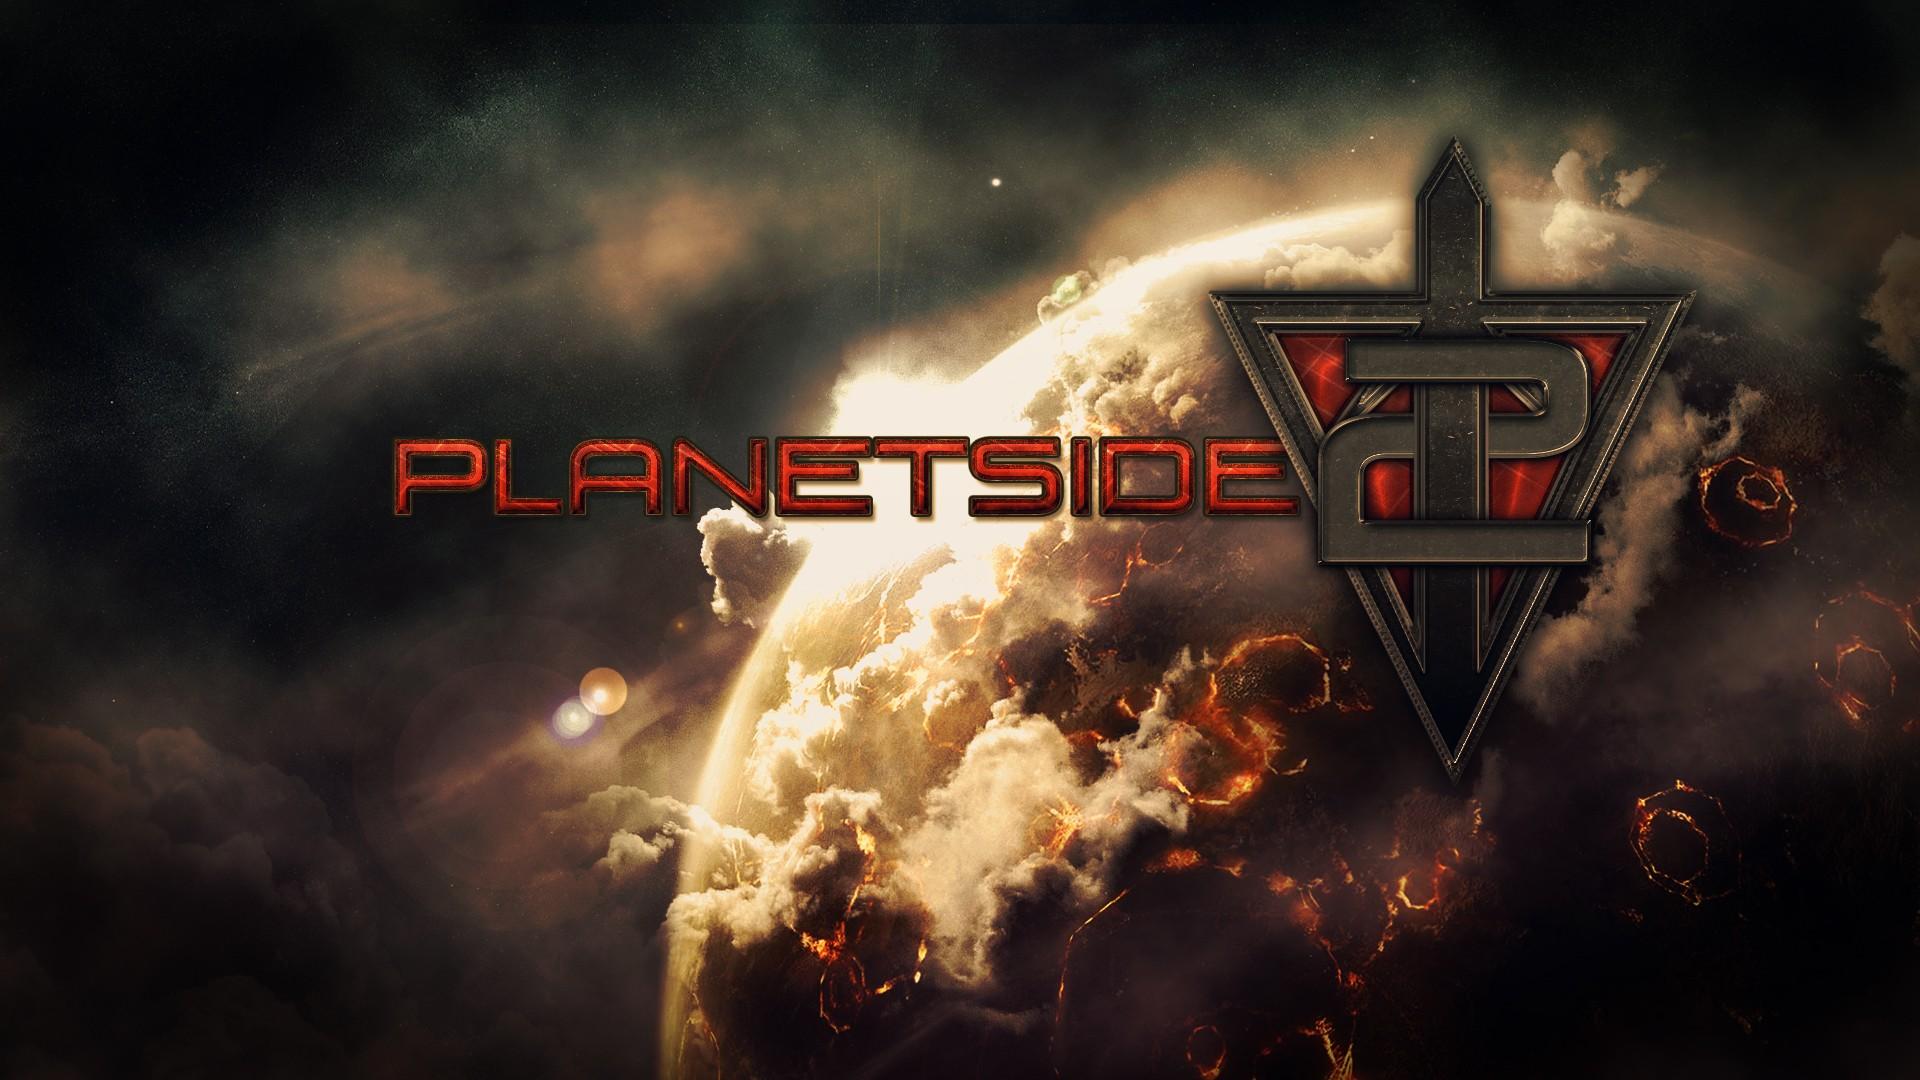 PlanetSide 2 HD Wallpaper 1920x1080 ID57655   WallpaperVortexcom 1920x1080